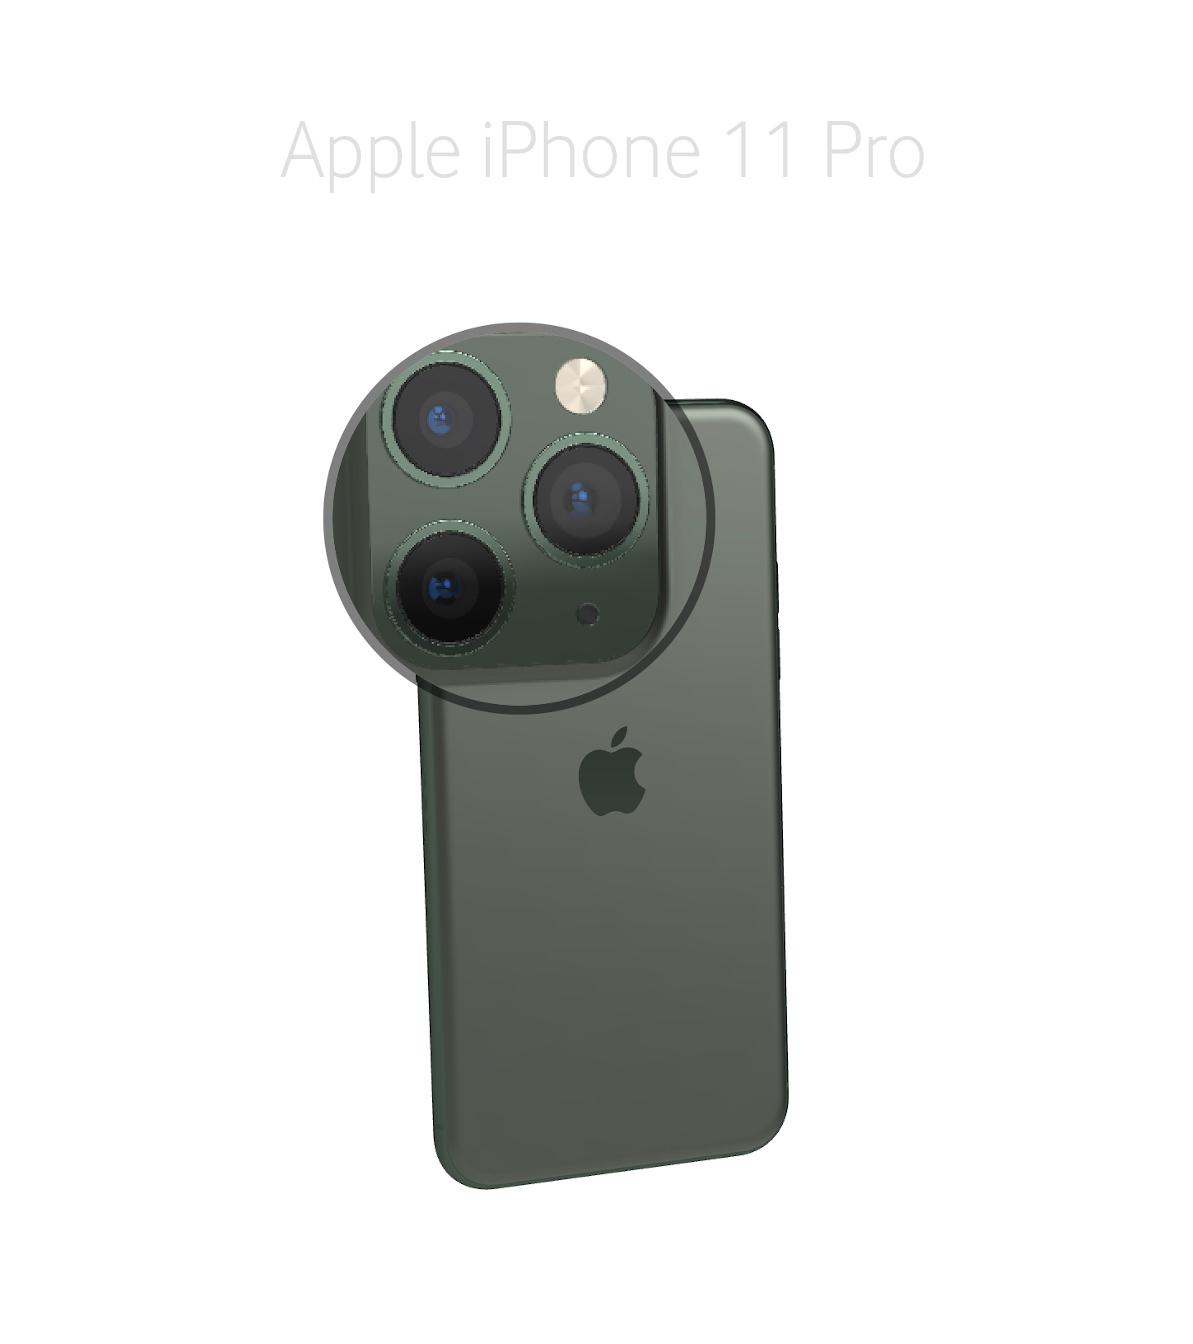 Laga mikrofon Kamera iPhone 11 Pro